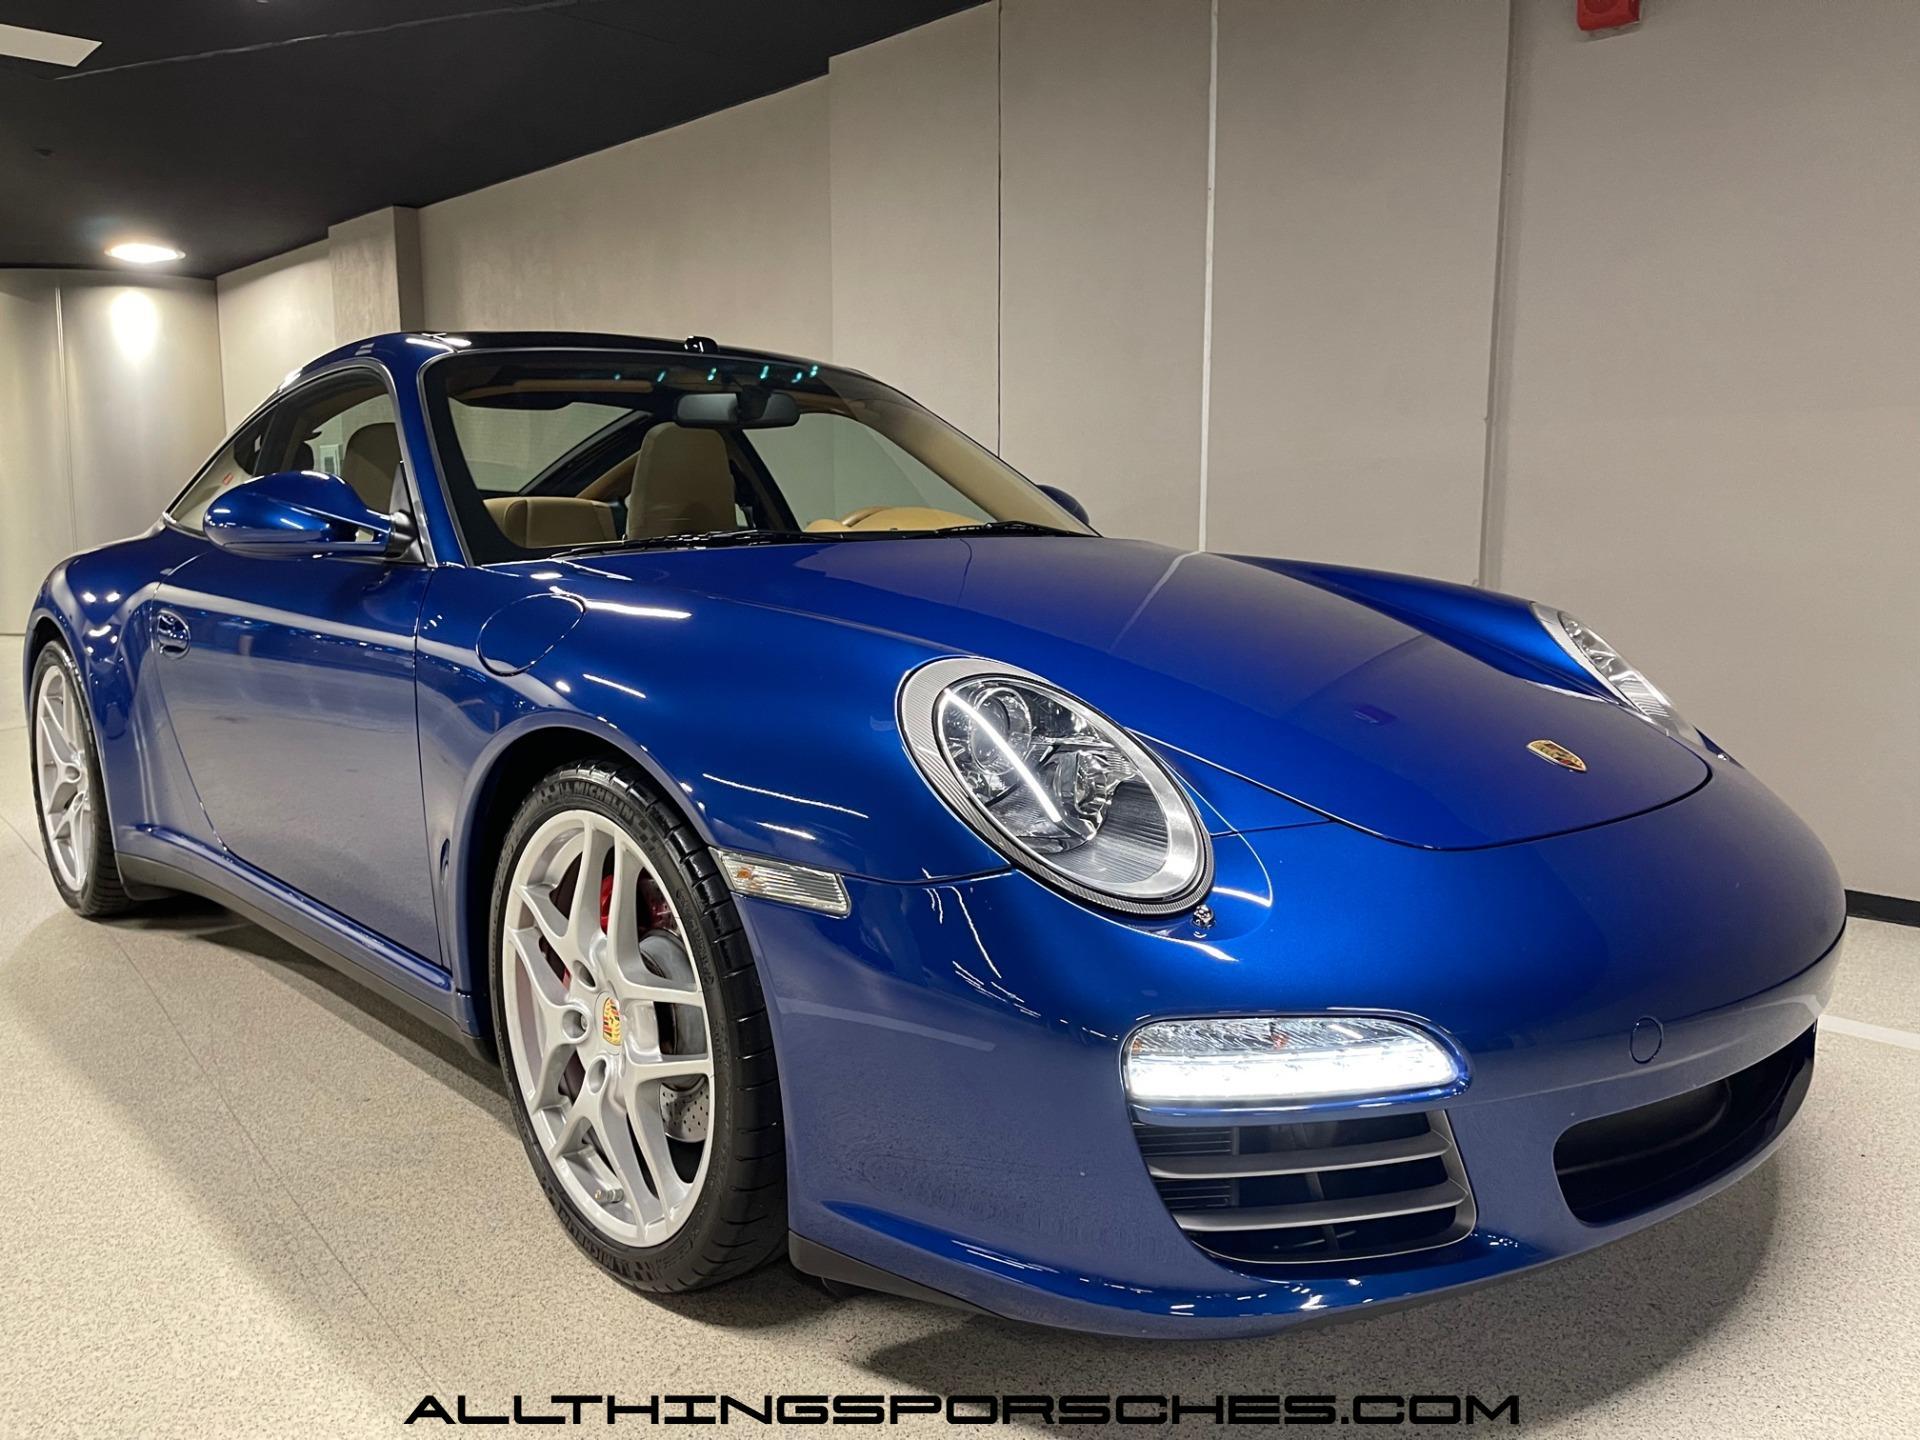 Used-2009-Porsche-911-Targa-4S